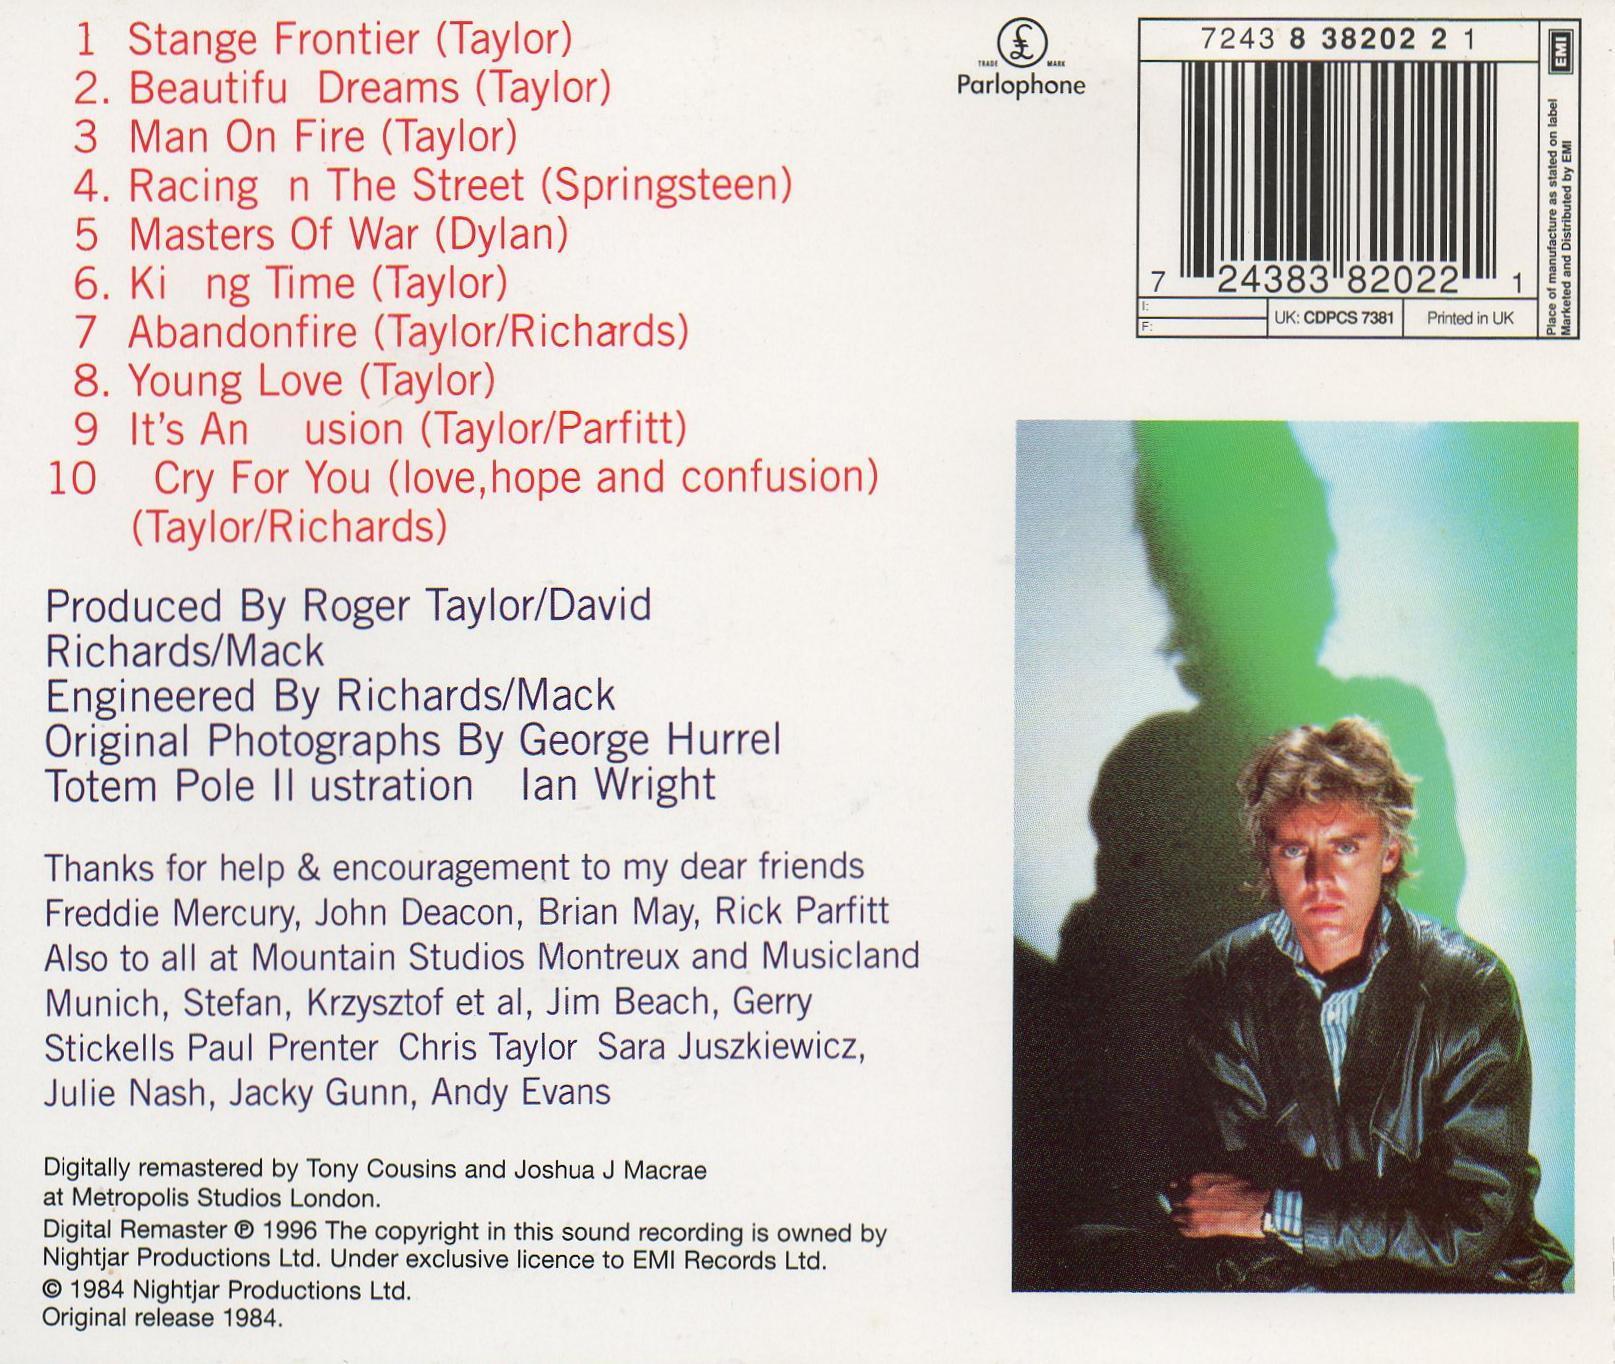 Roger Taylor Quot Strange Frontier Quot Album Gallery